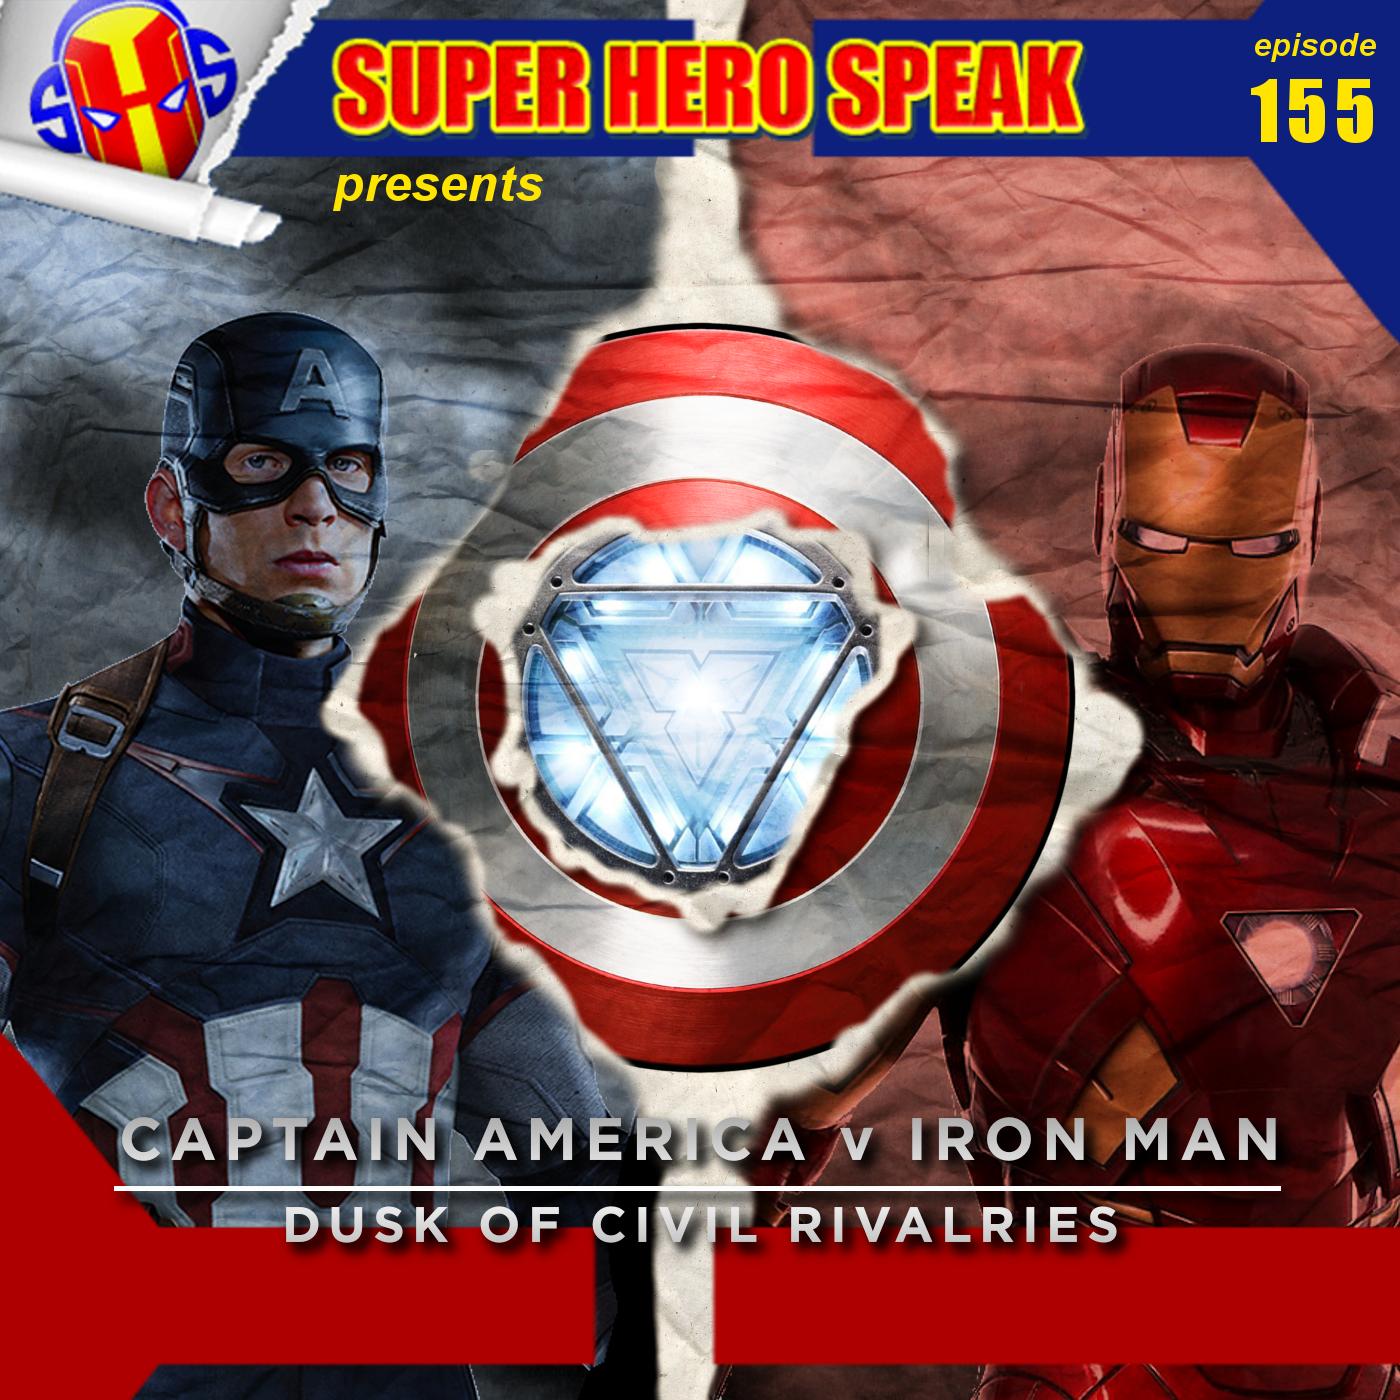 #155: Captain America v Iron Man: Dusk of Civil Rivalries